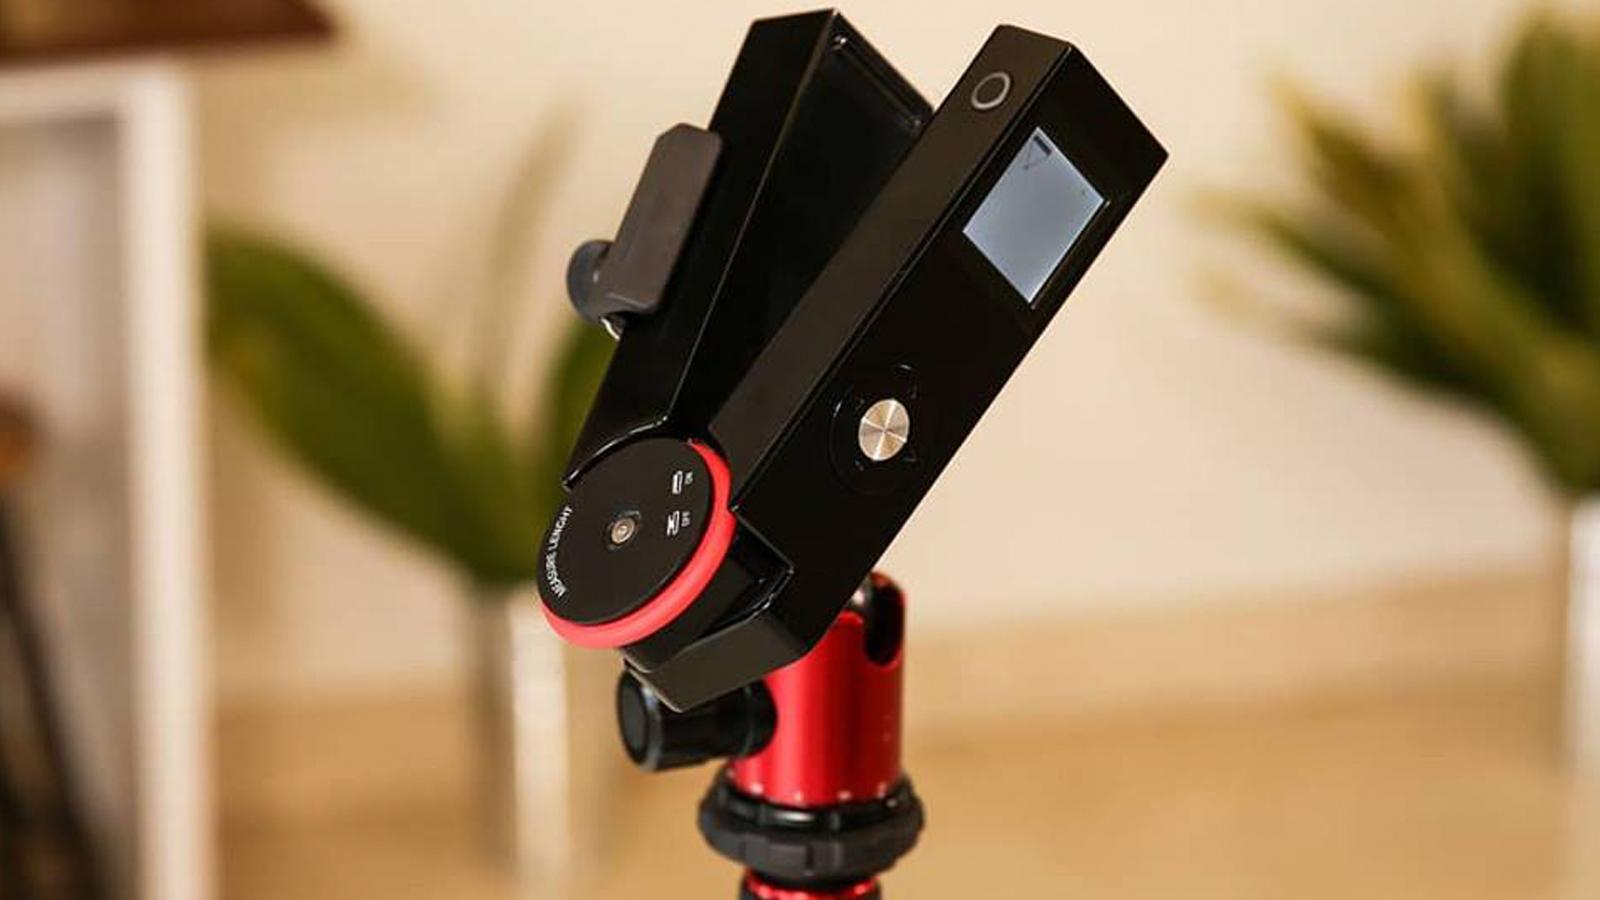 Laser Entfernungsmesser Mit Stativ : Innovativer laser entfernungsmesser nimmt aus der weite präzise maß